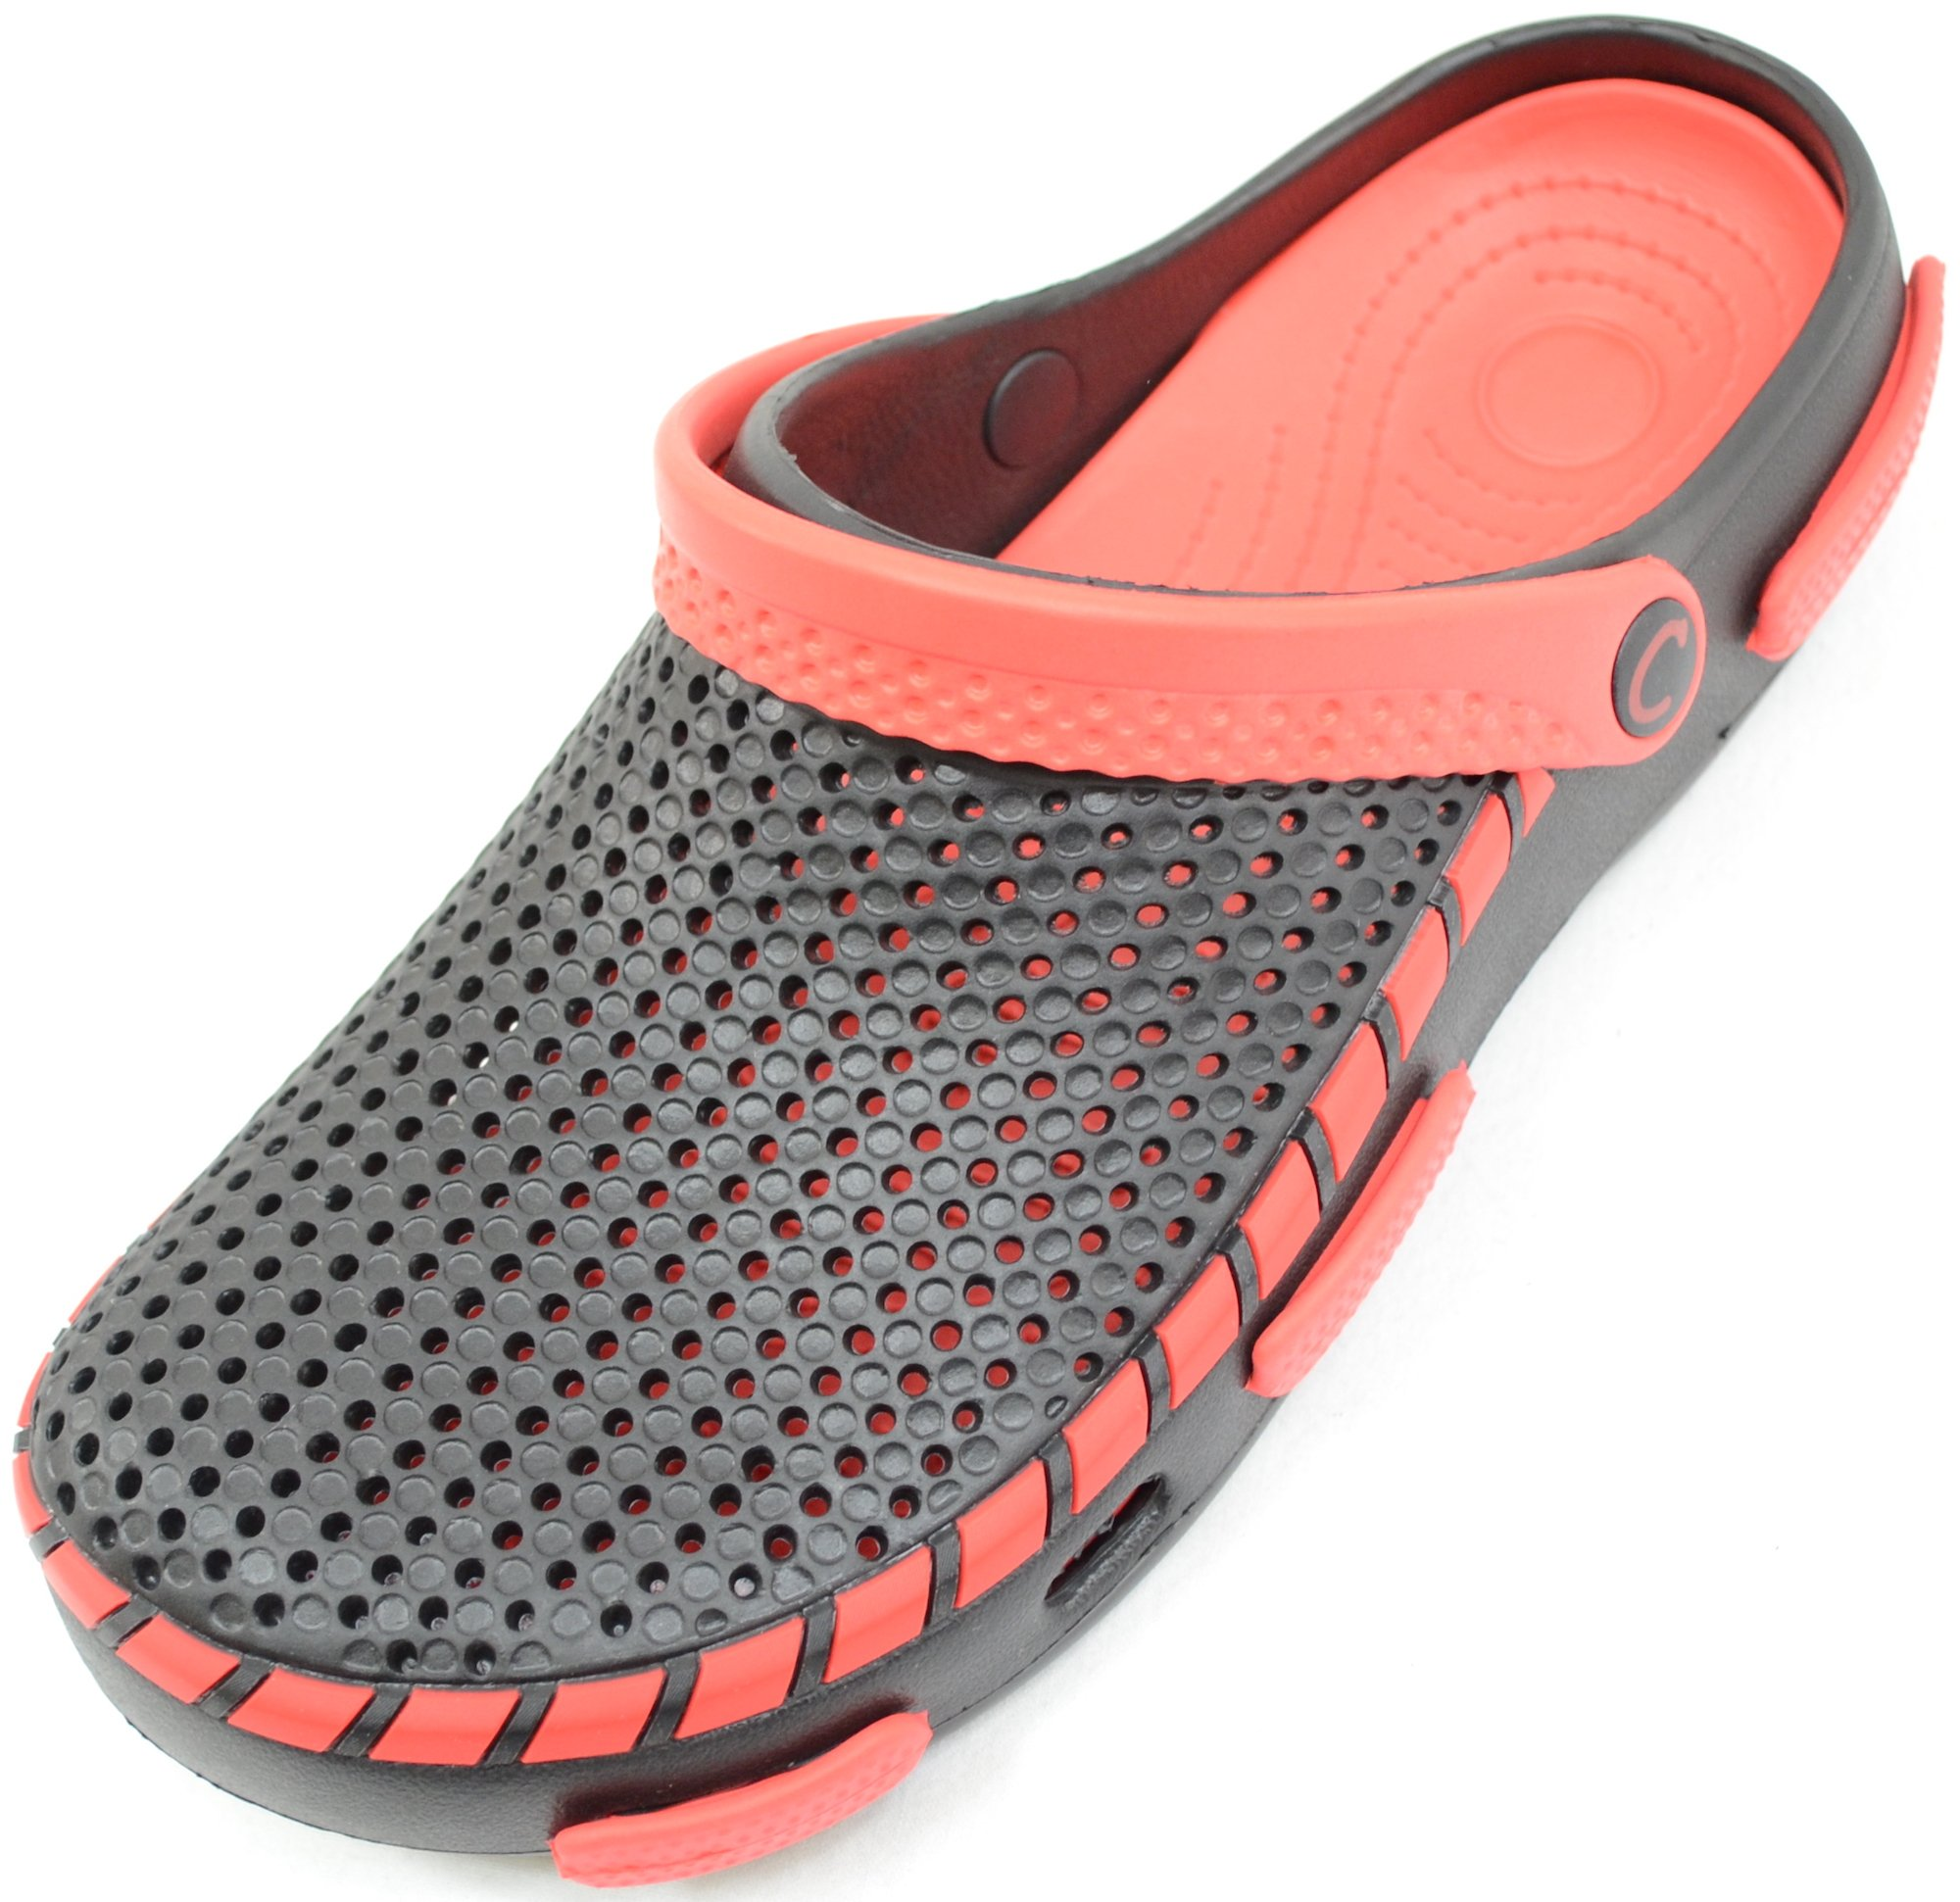 ABSOLUTE FOOTWEAR Mens Summer/Garden / Beach/Holiday / Hospital Clogs/Sandals - Black - 10 US